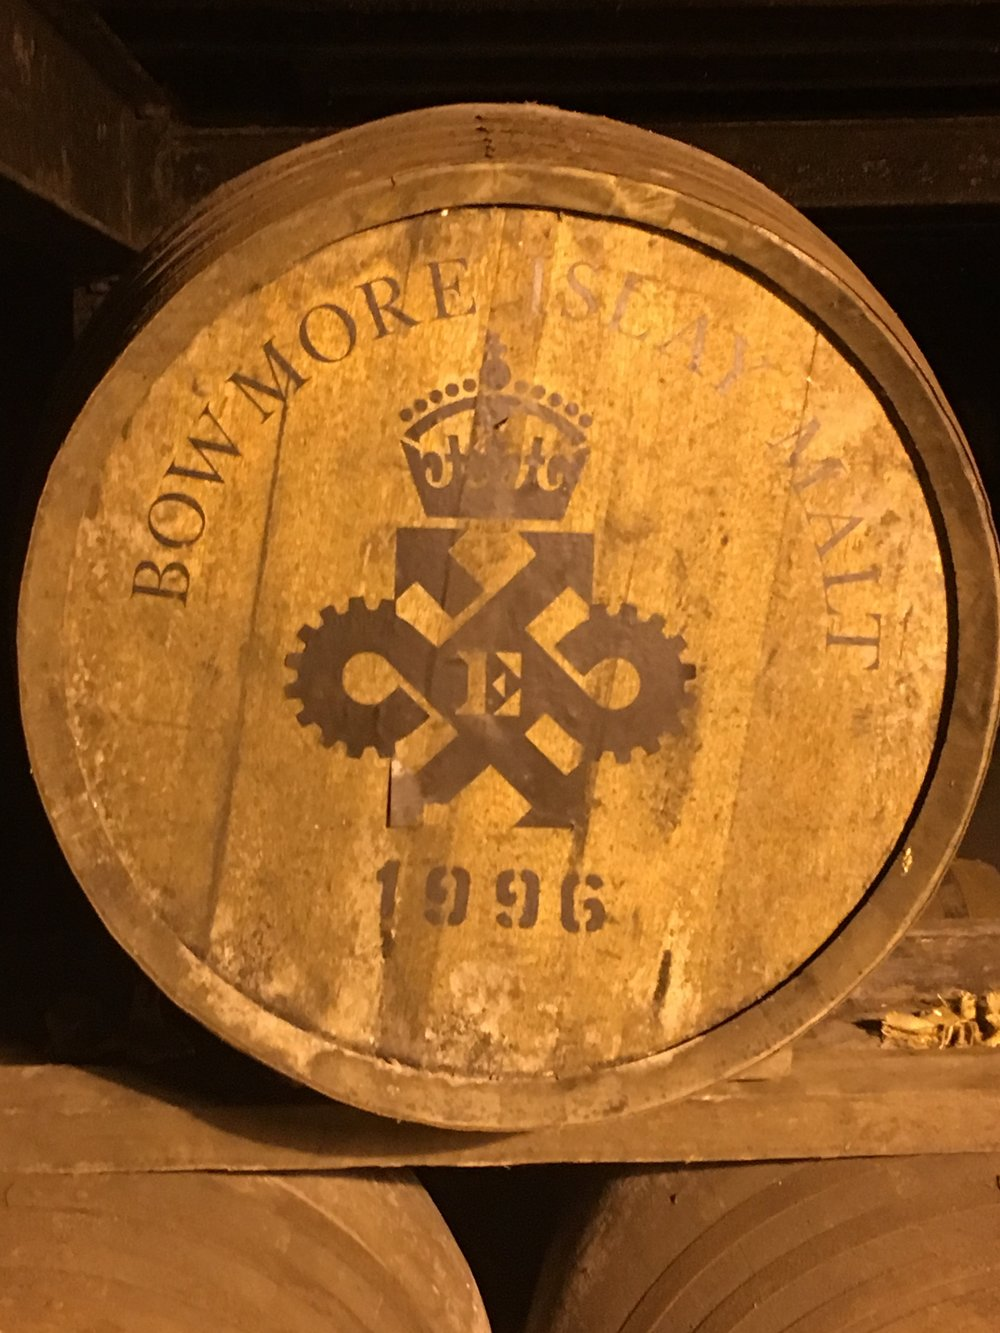 Maturing Cask at Bowmore Distillery